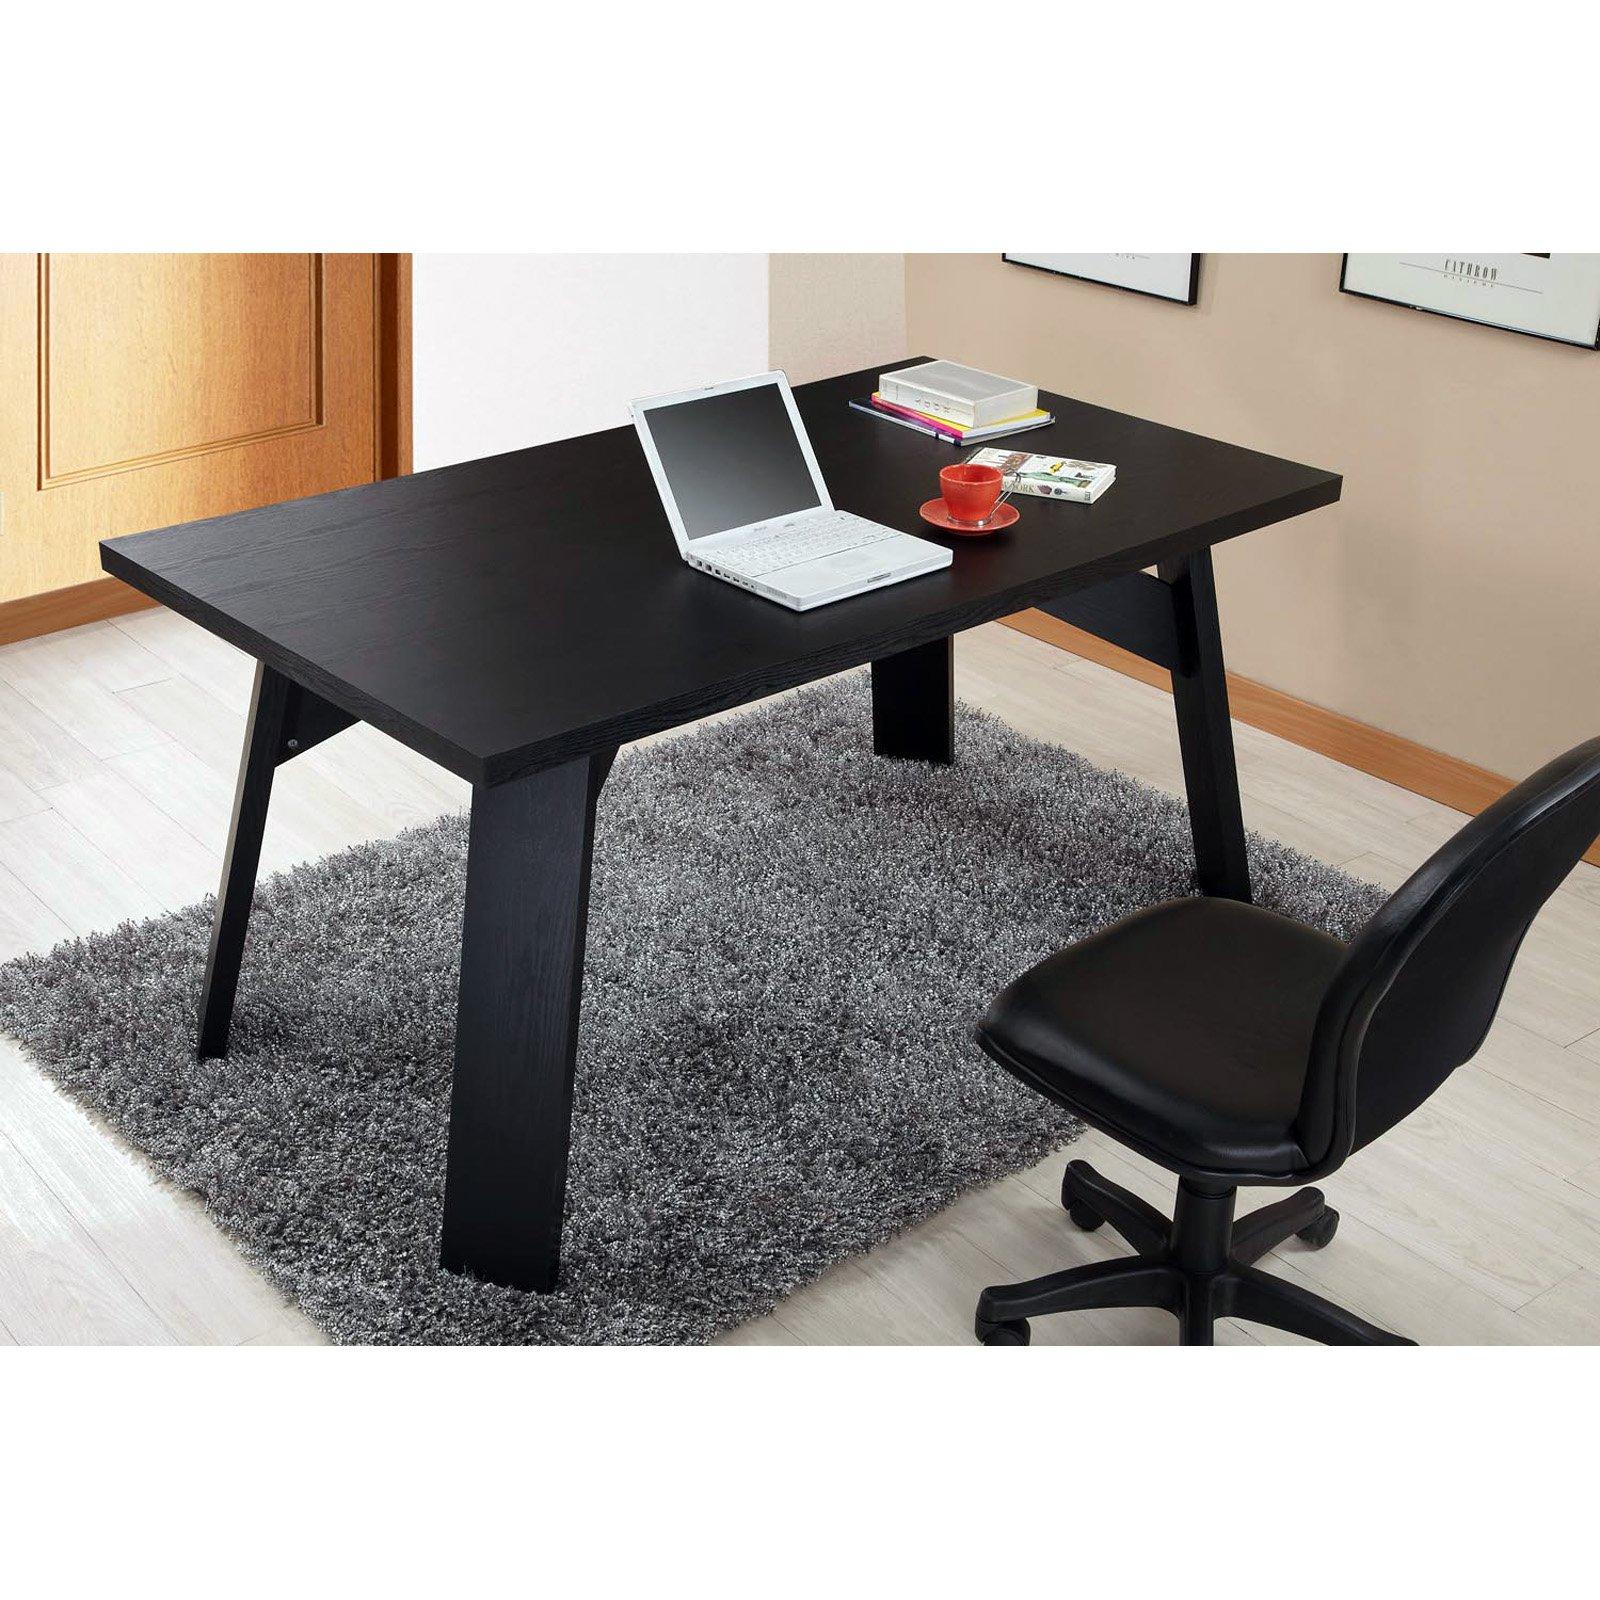 Furniture of America Porta Office Desk by Hokku Designs